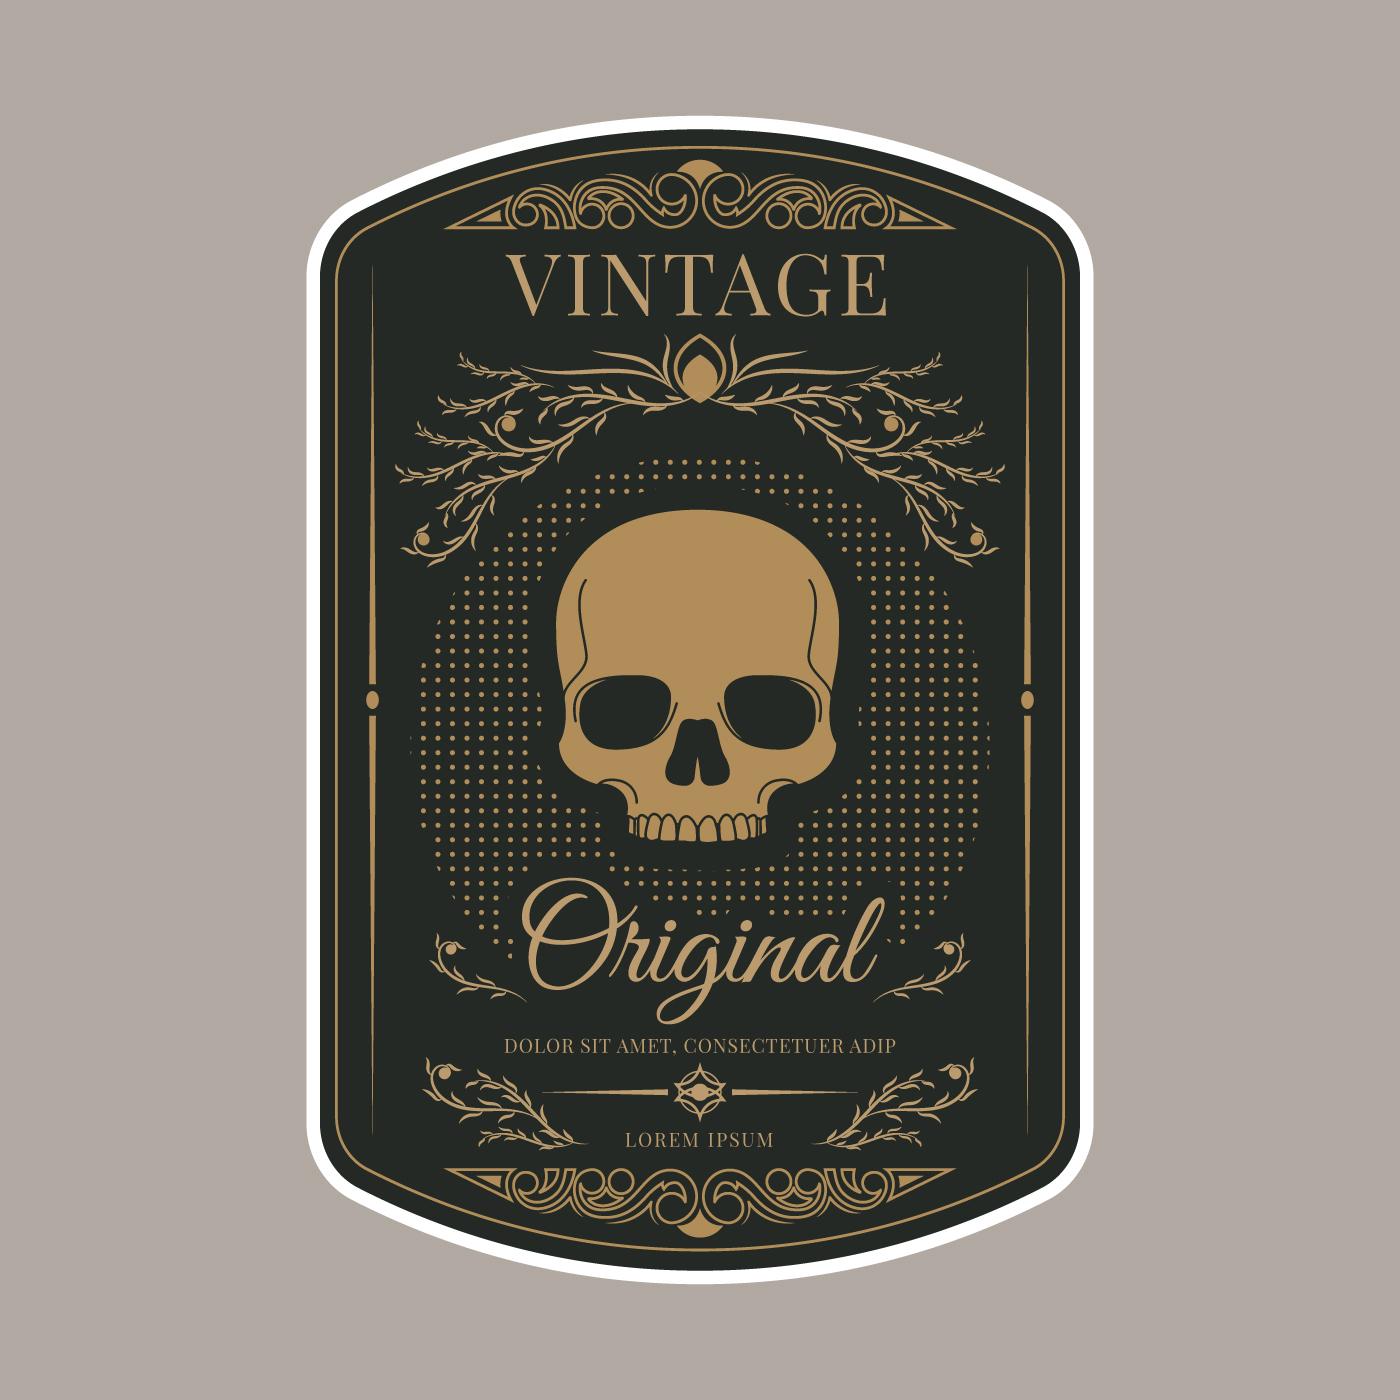 Retro Vintage Label Template - Download Free Vectors ...